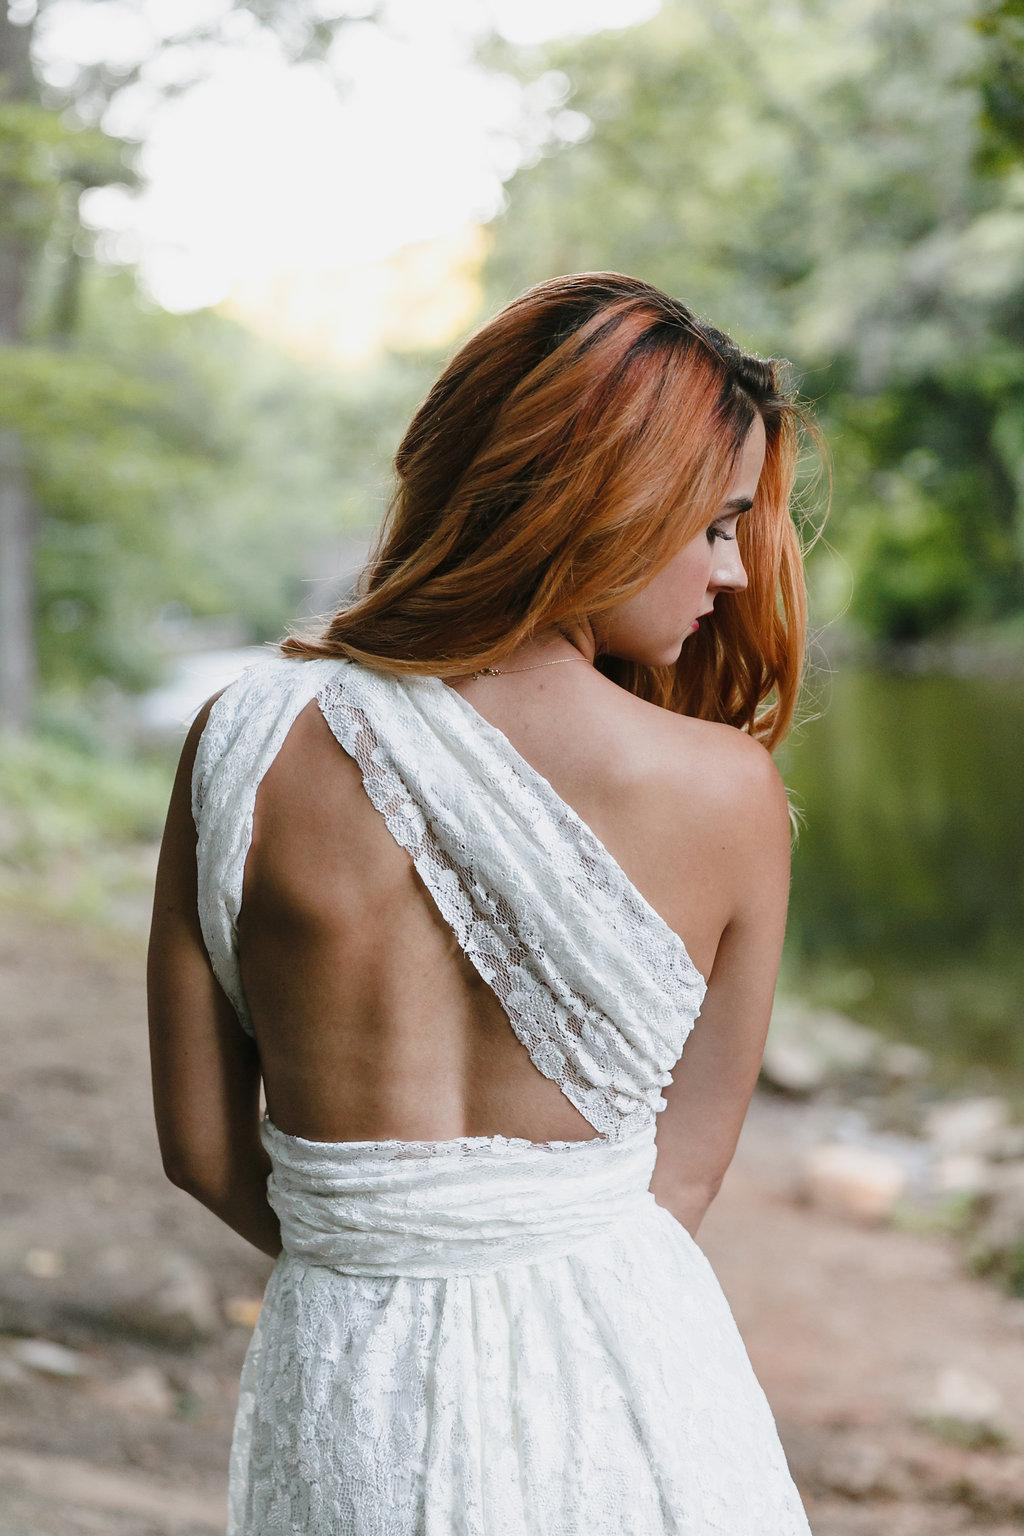 L Priori Jewelry Proposal Philadelphia Wedding Ring Philly In Love Philadelphia Weddings